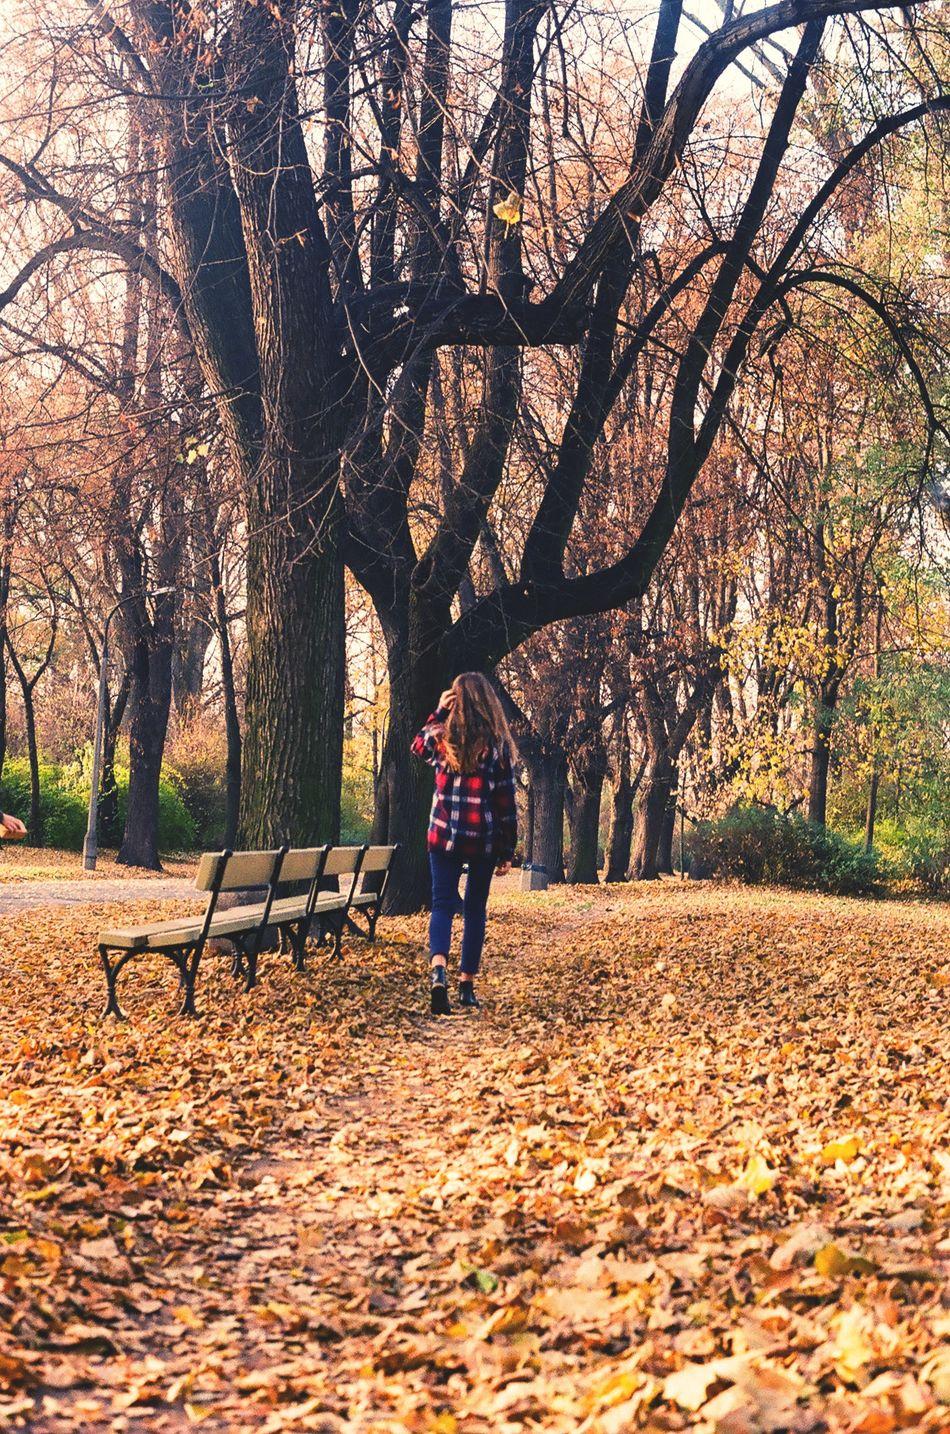 Photo Photography Girl Warszawa  Warsaw Poland Polska Saska Kepa Fall Autumn Jesień Park Skaryszewski 35mm Minoltasrt101 Minolta Park